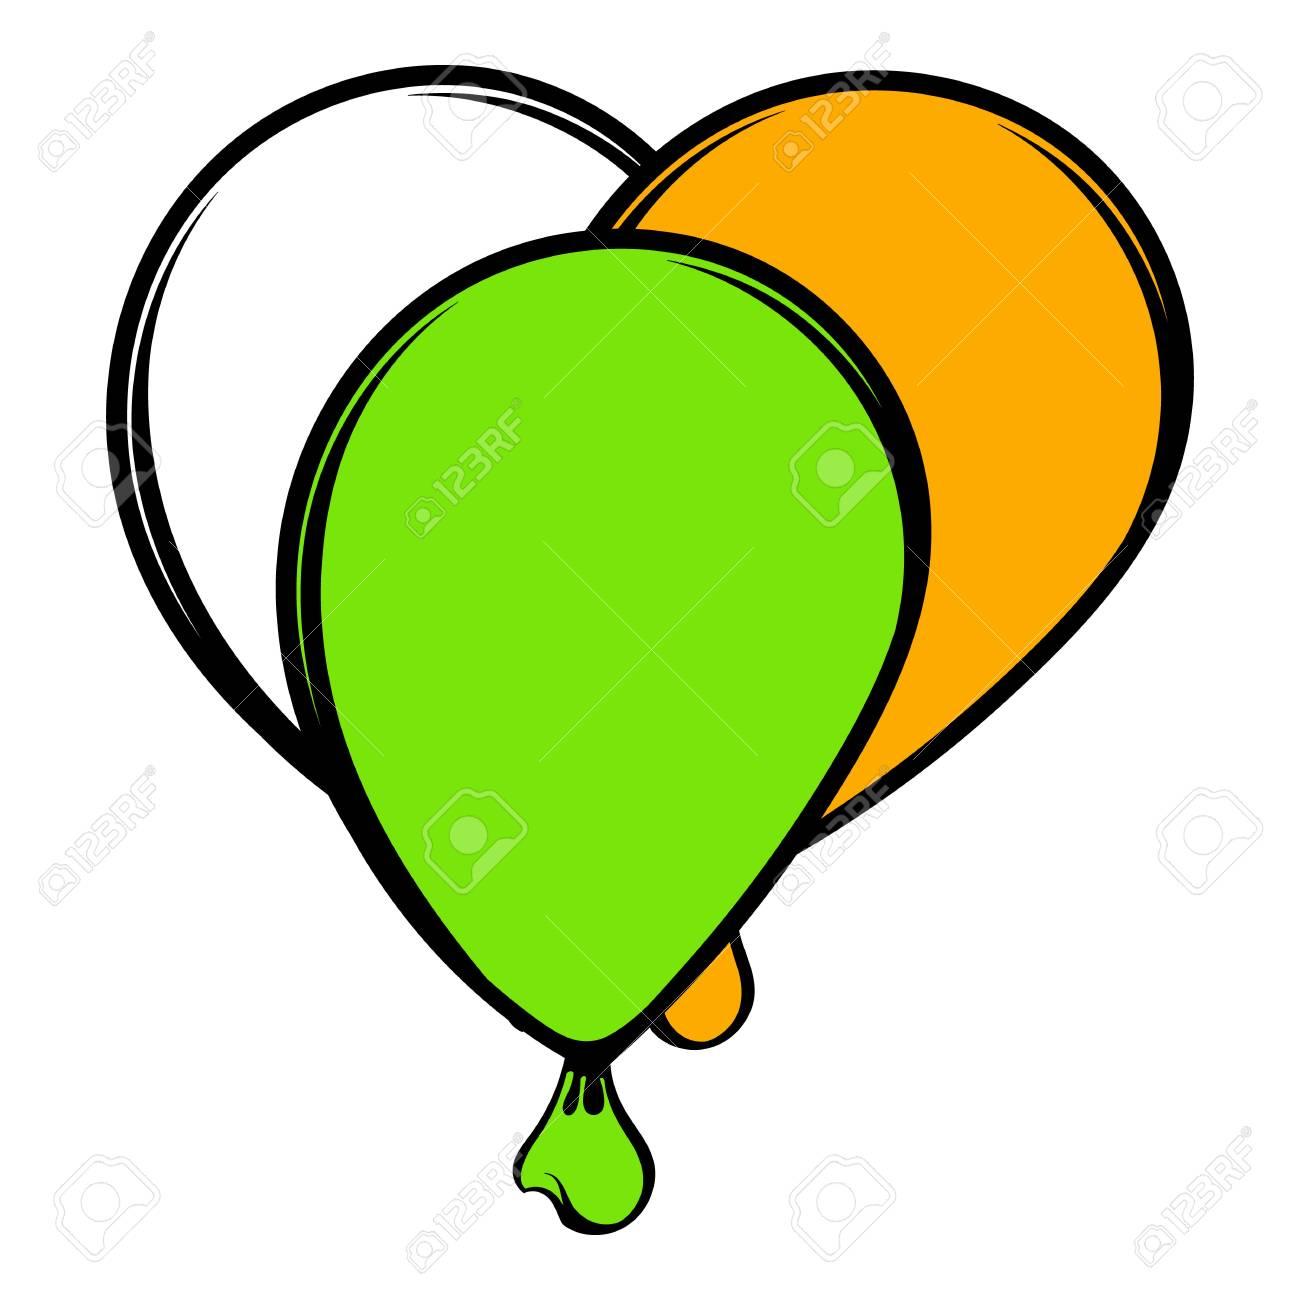 Ballons En Icone De Couleurs Irlandaises Icone Dessin Anime Clip